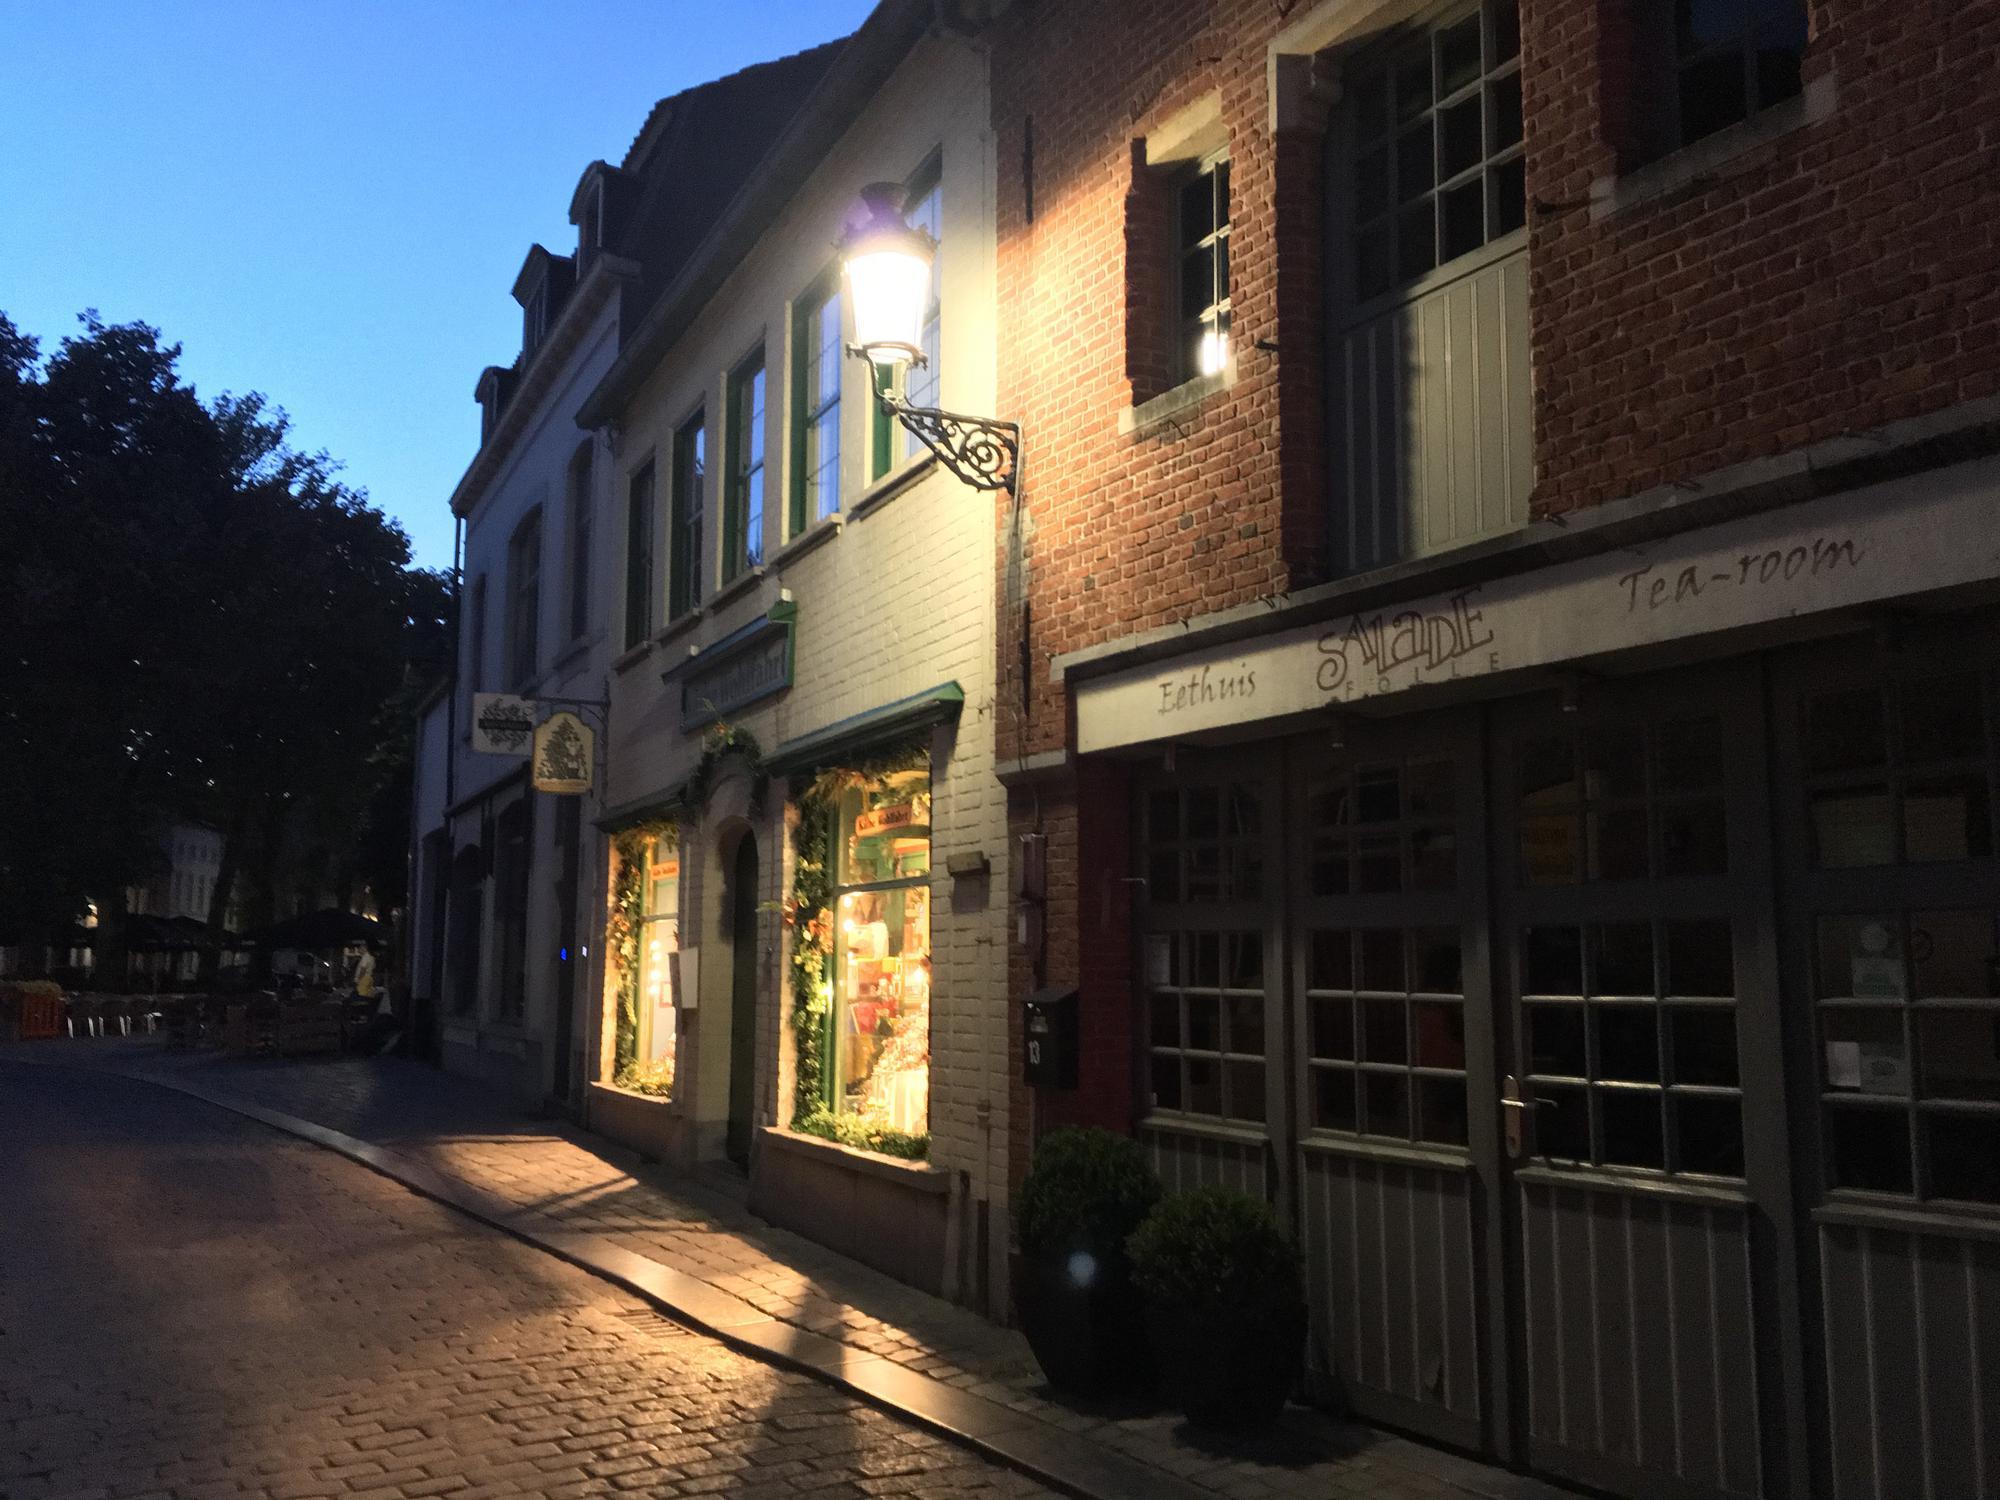 🇧🇪 Брюгге, Бельгия, июль 2017.